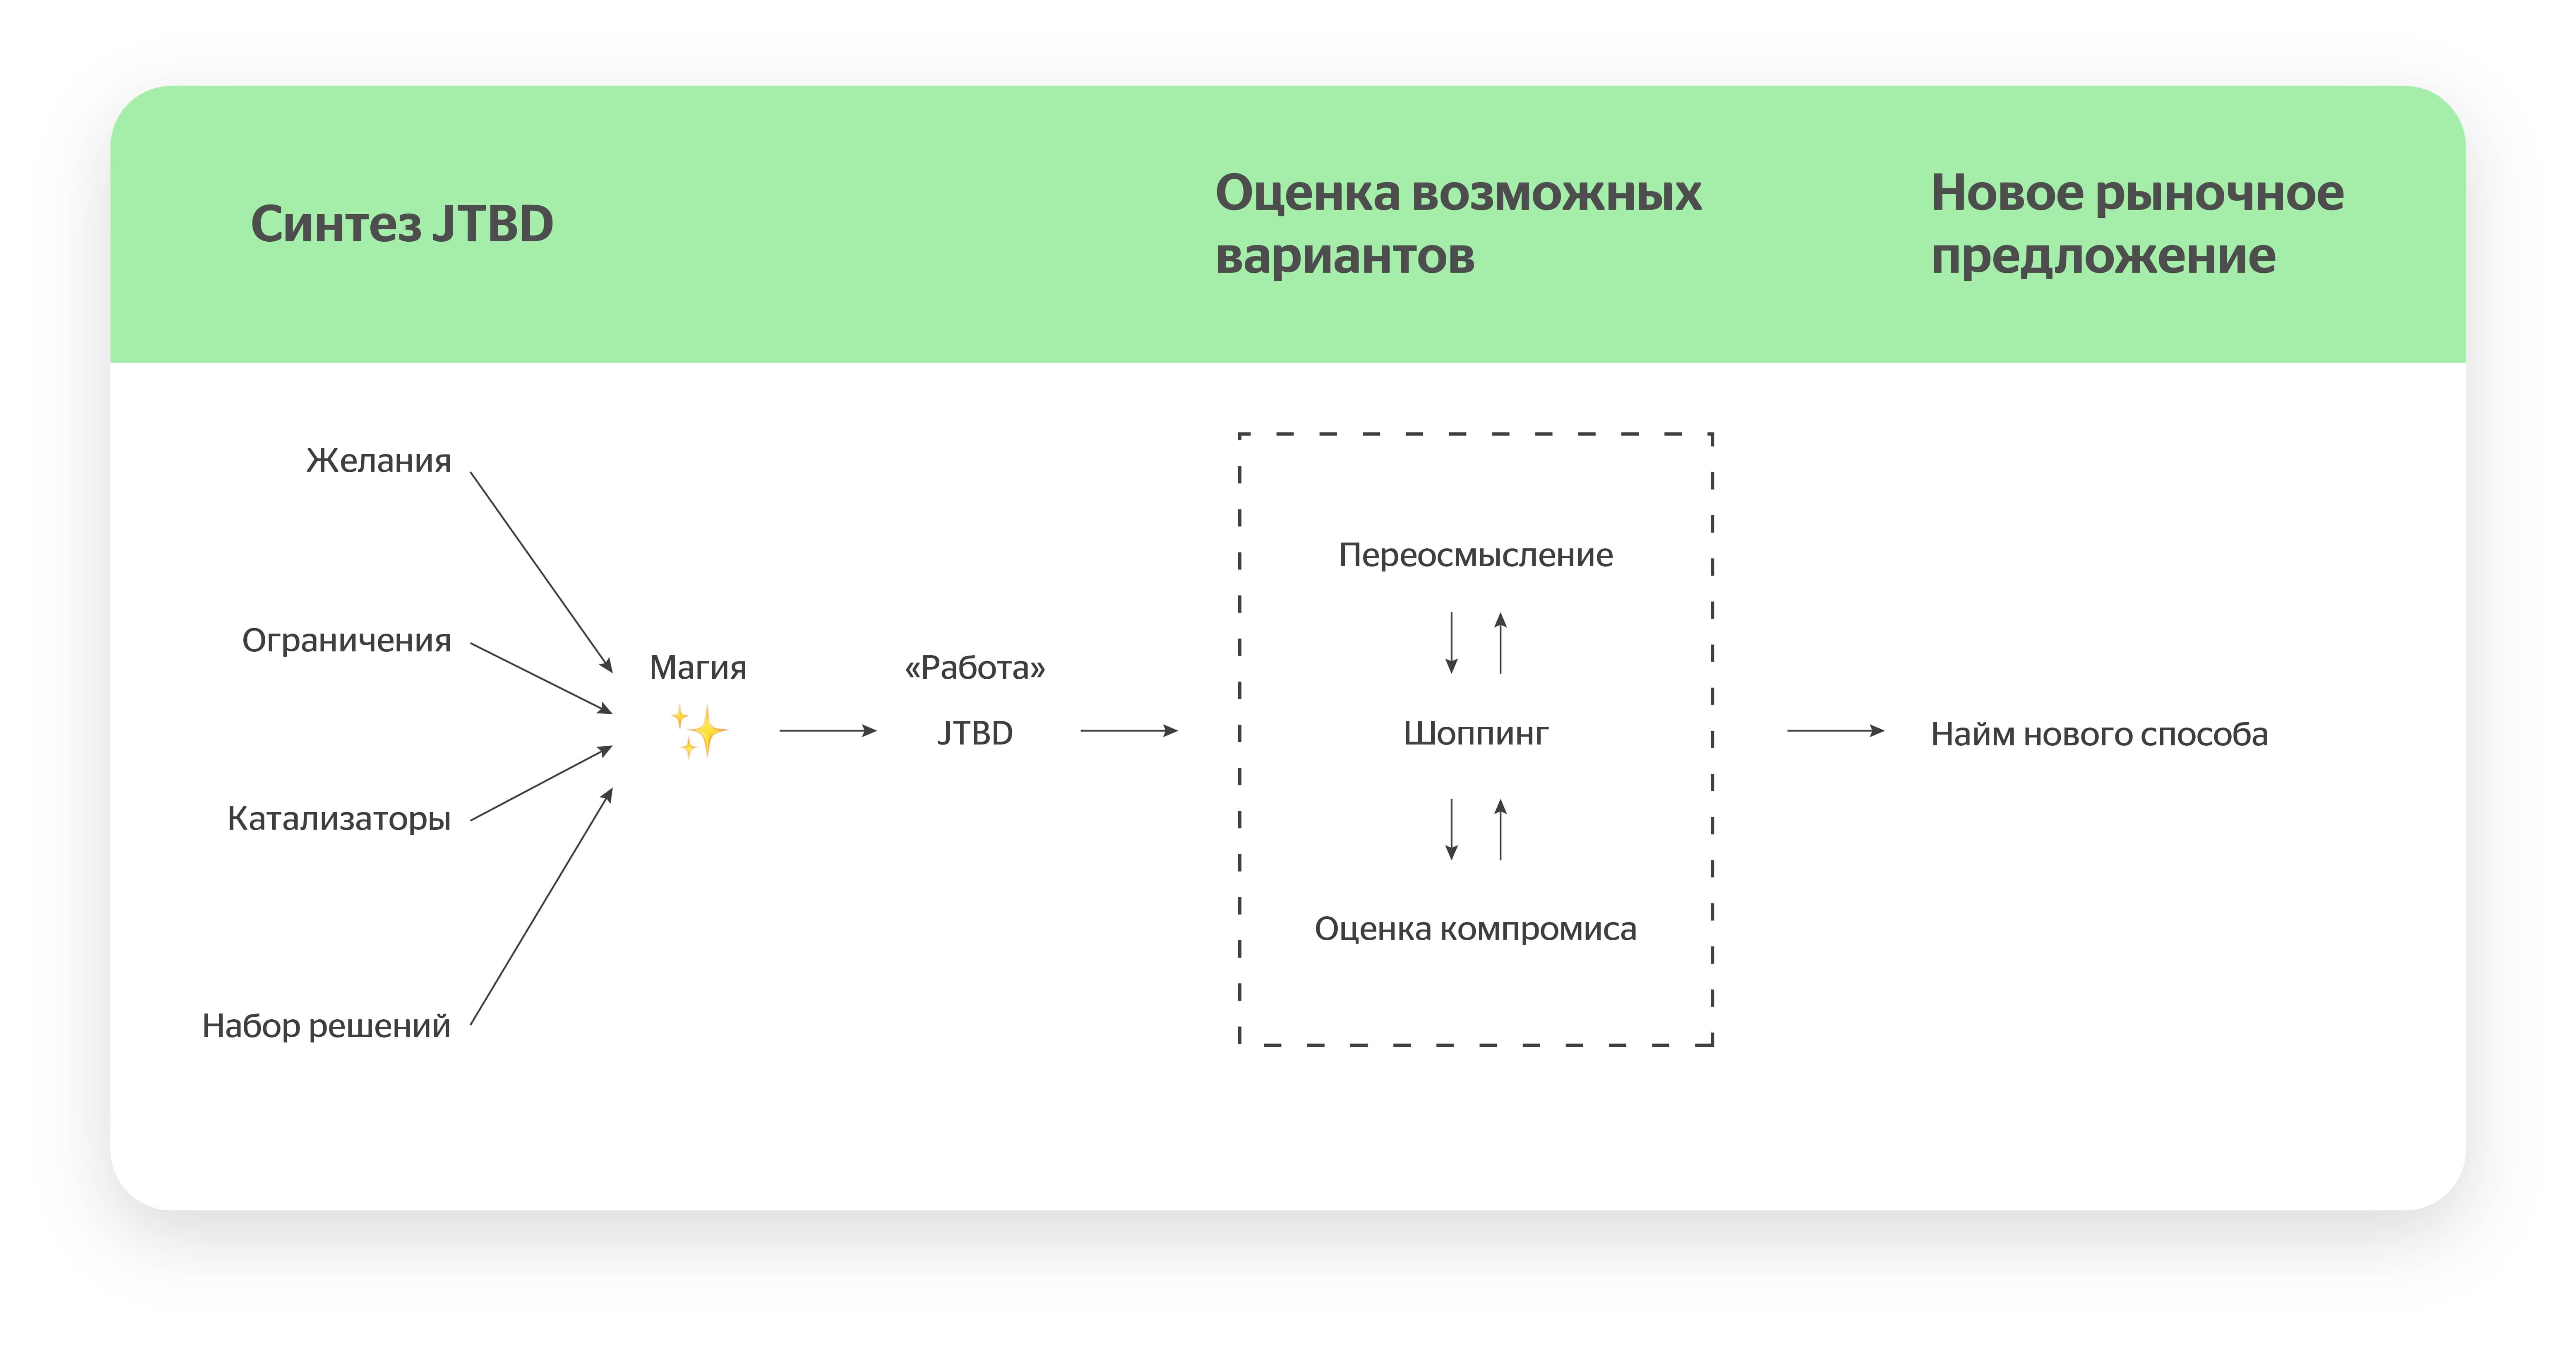 JTBD framework